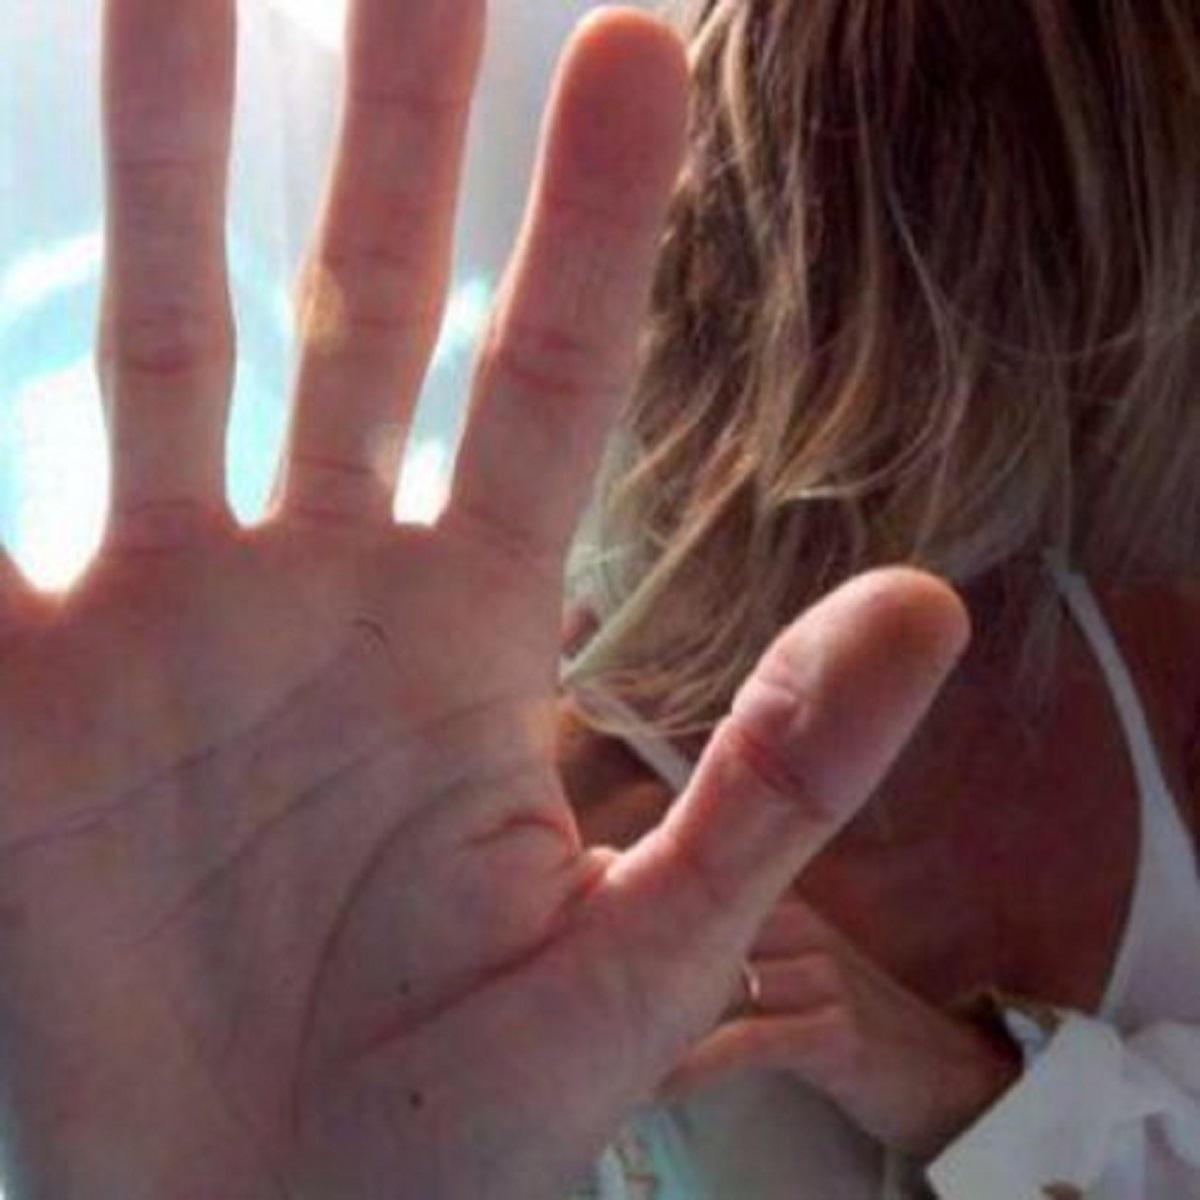 padre difende gli stupratori